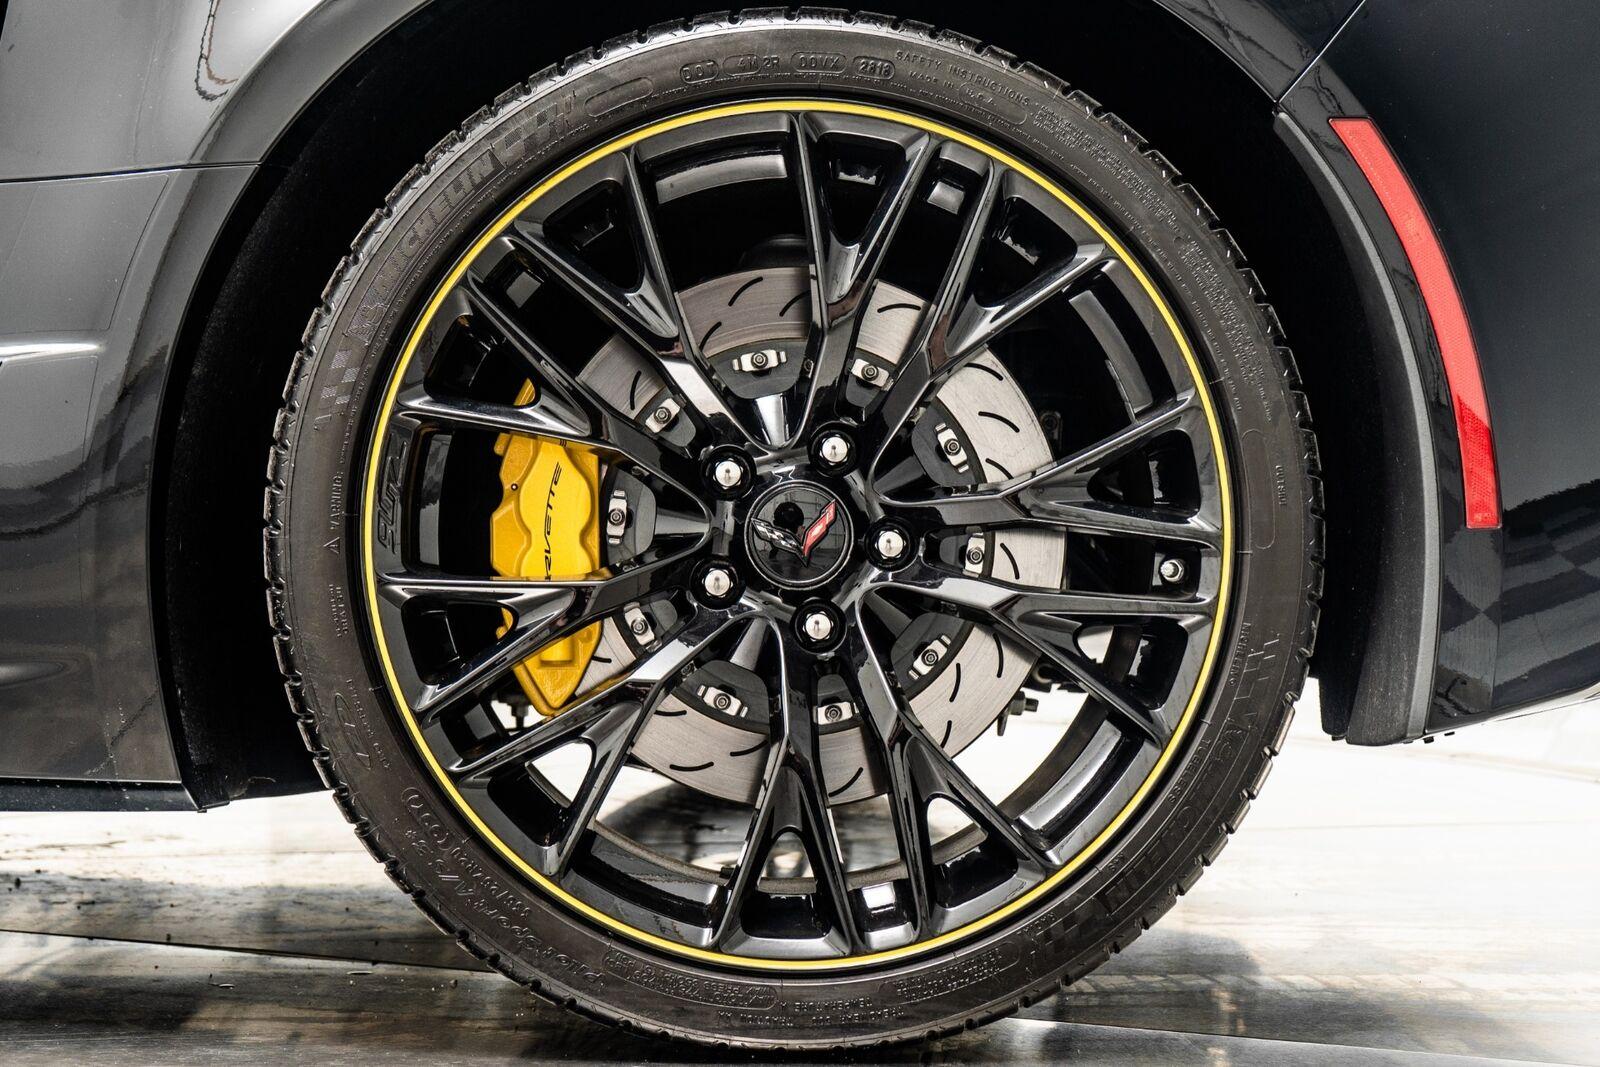 2018 Black Chevrolet Corvette Z06 3LZ   C7 Corvette Photo 10